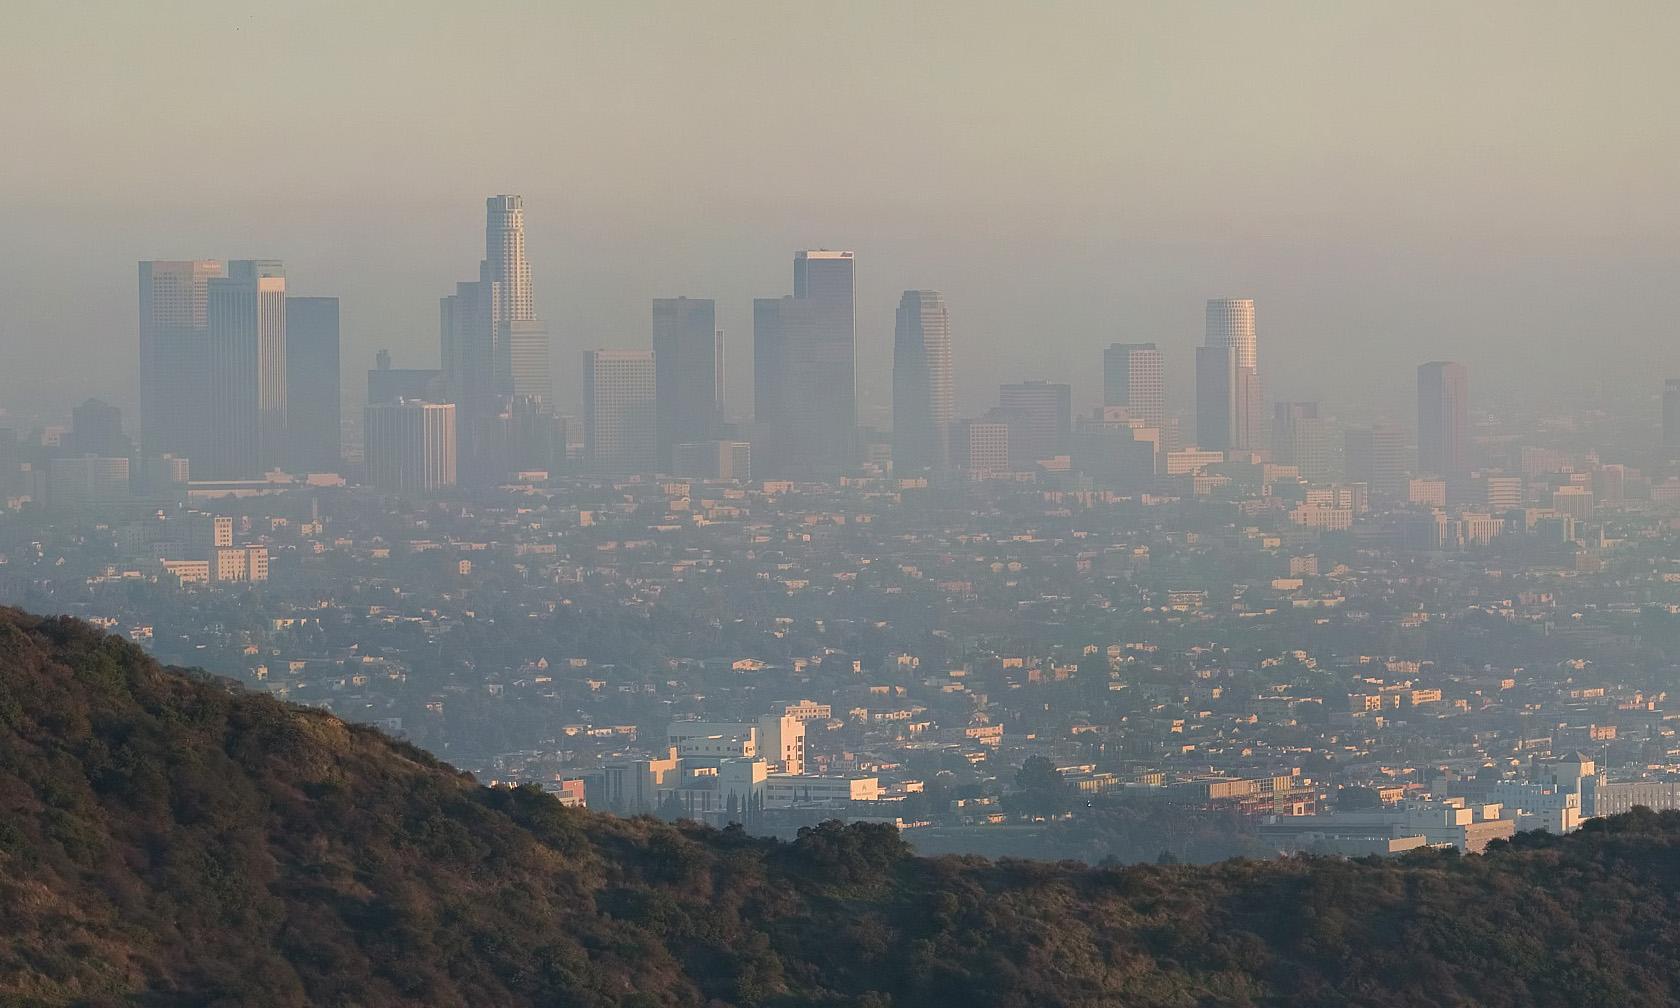 A shot of Los Angeles through thick smog